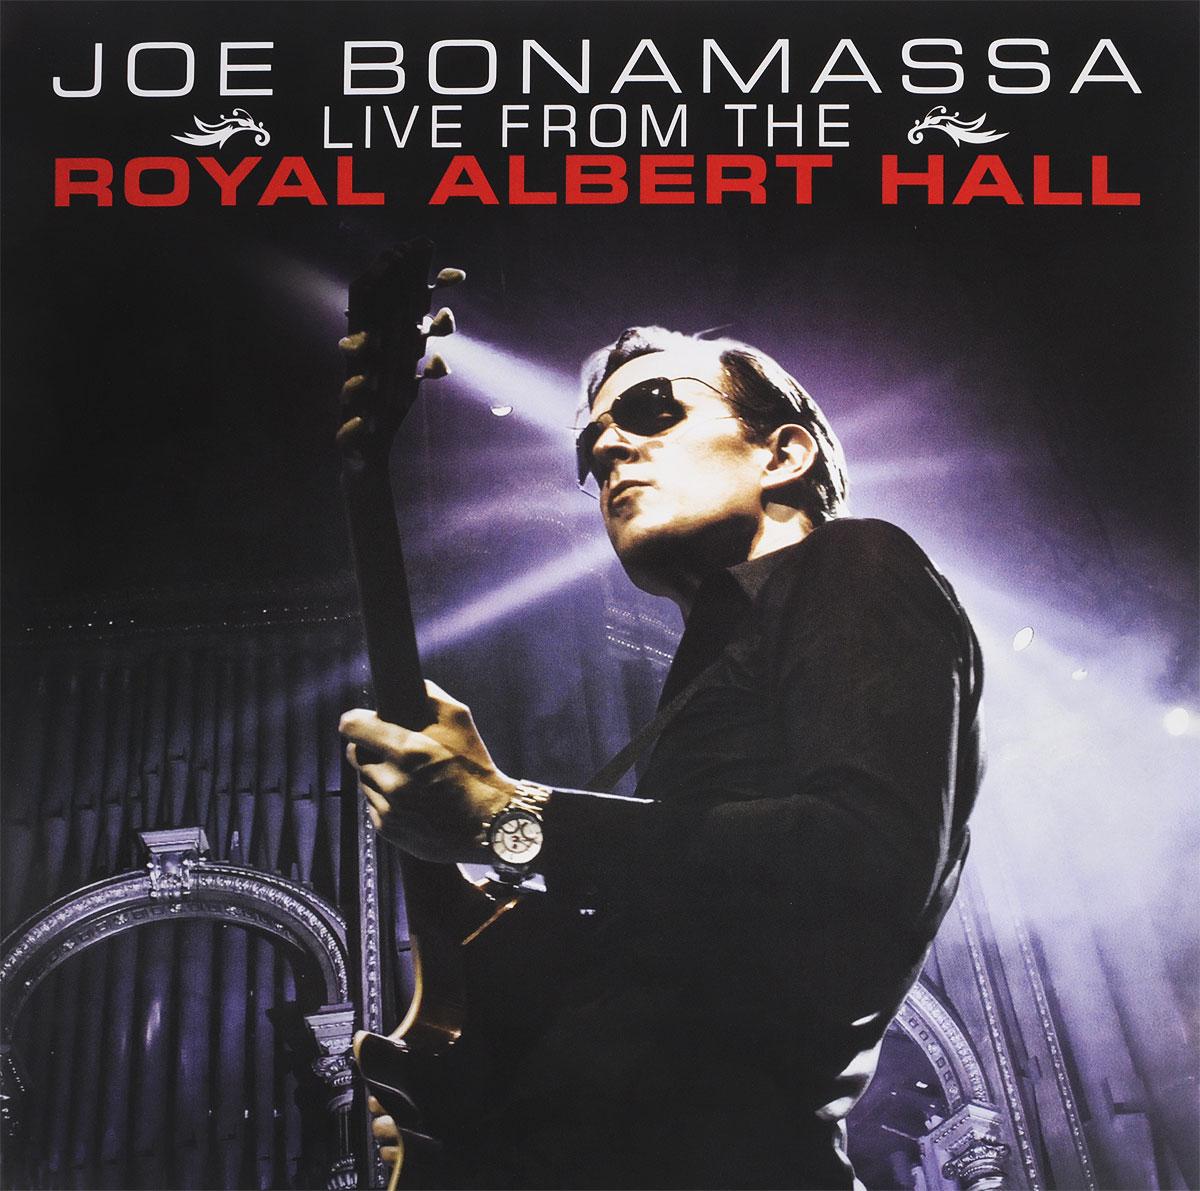 Джо Бонамасса Joe Bonamassa. Live From The Royal Albert Hall (2 LP) pete townshend s classic quadrophenia live from the royal albert hall